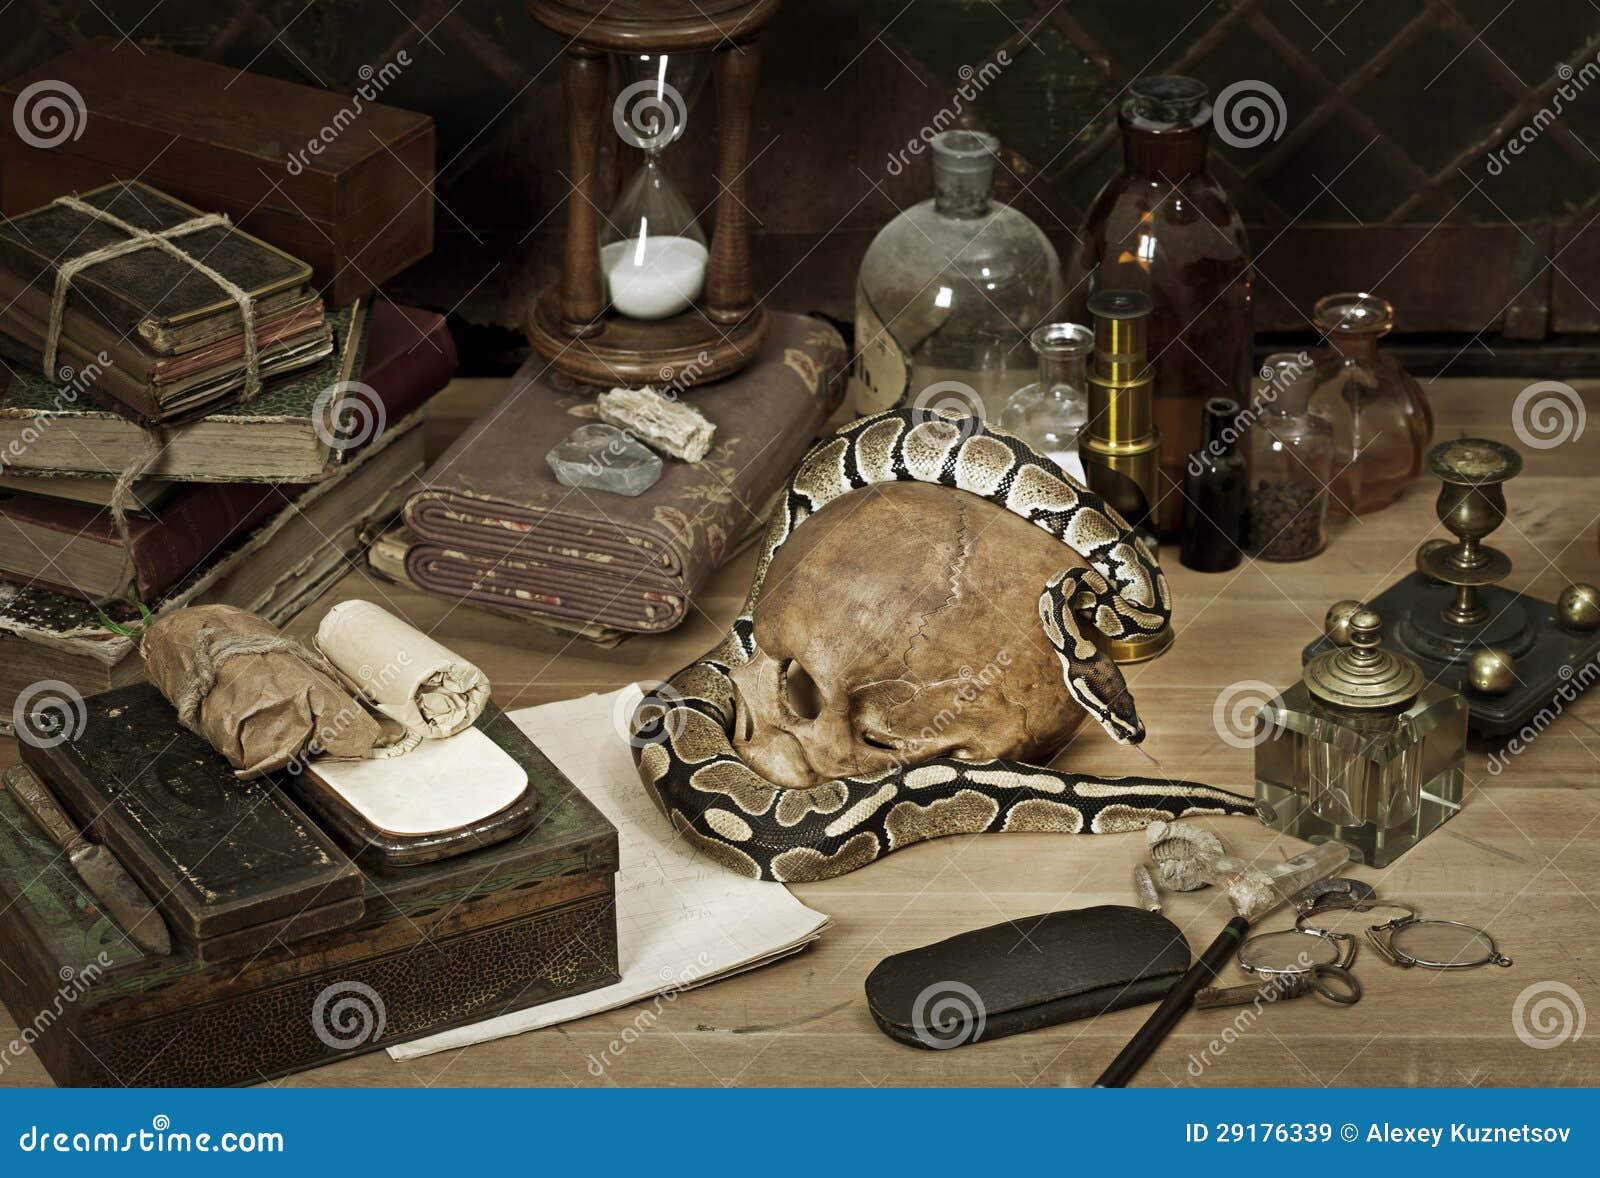 Alchemy still life with Royal Python